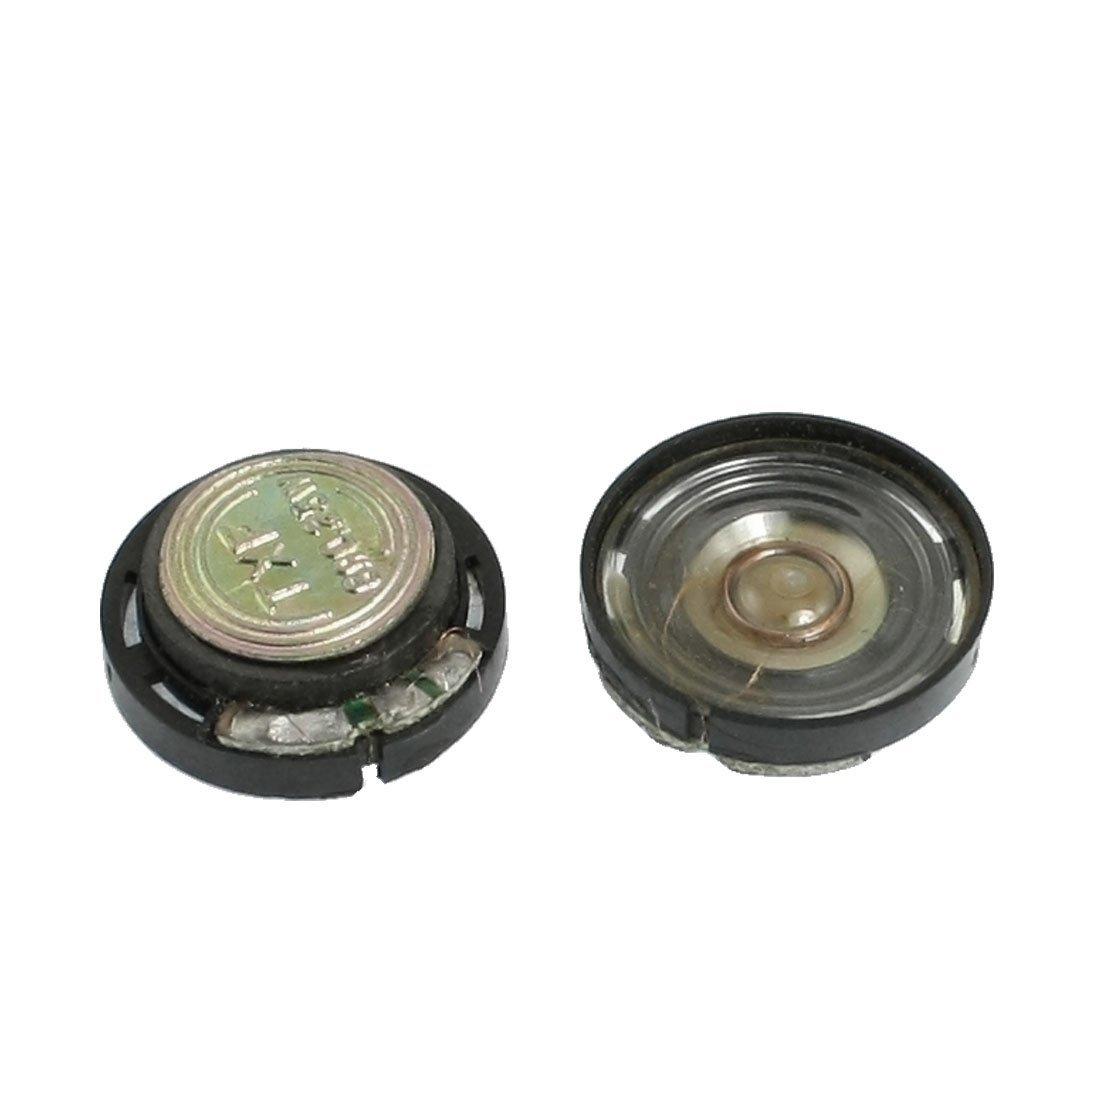 TOOGOO(R) 20mm External Magnetic Type Round Slim Plastic Shell Speaker 8 Ohm 0.25W 2 Pcs